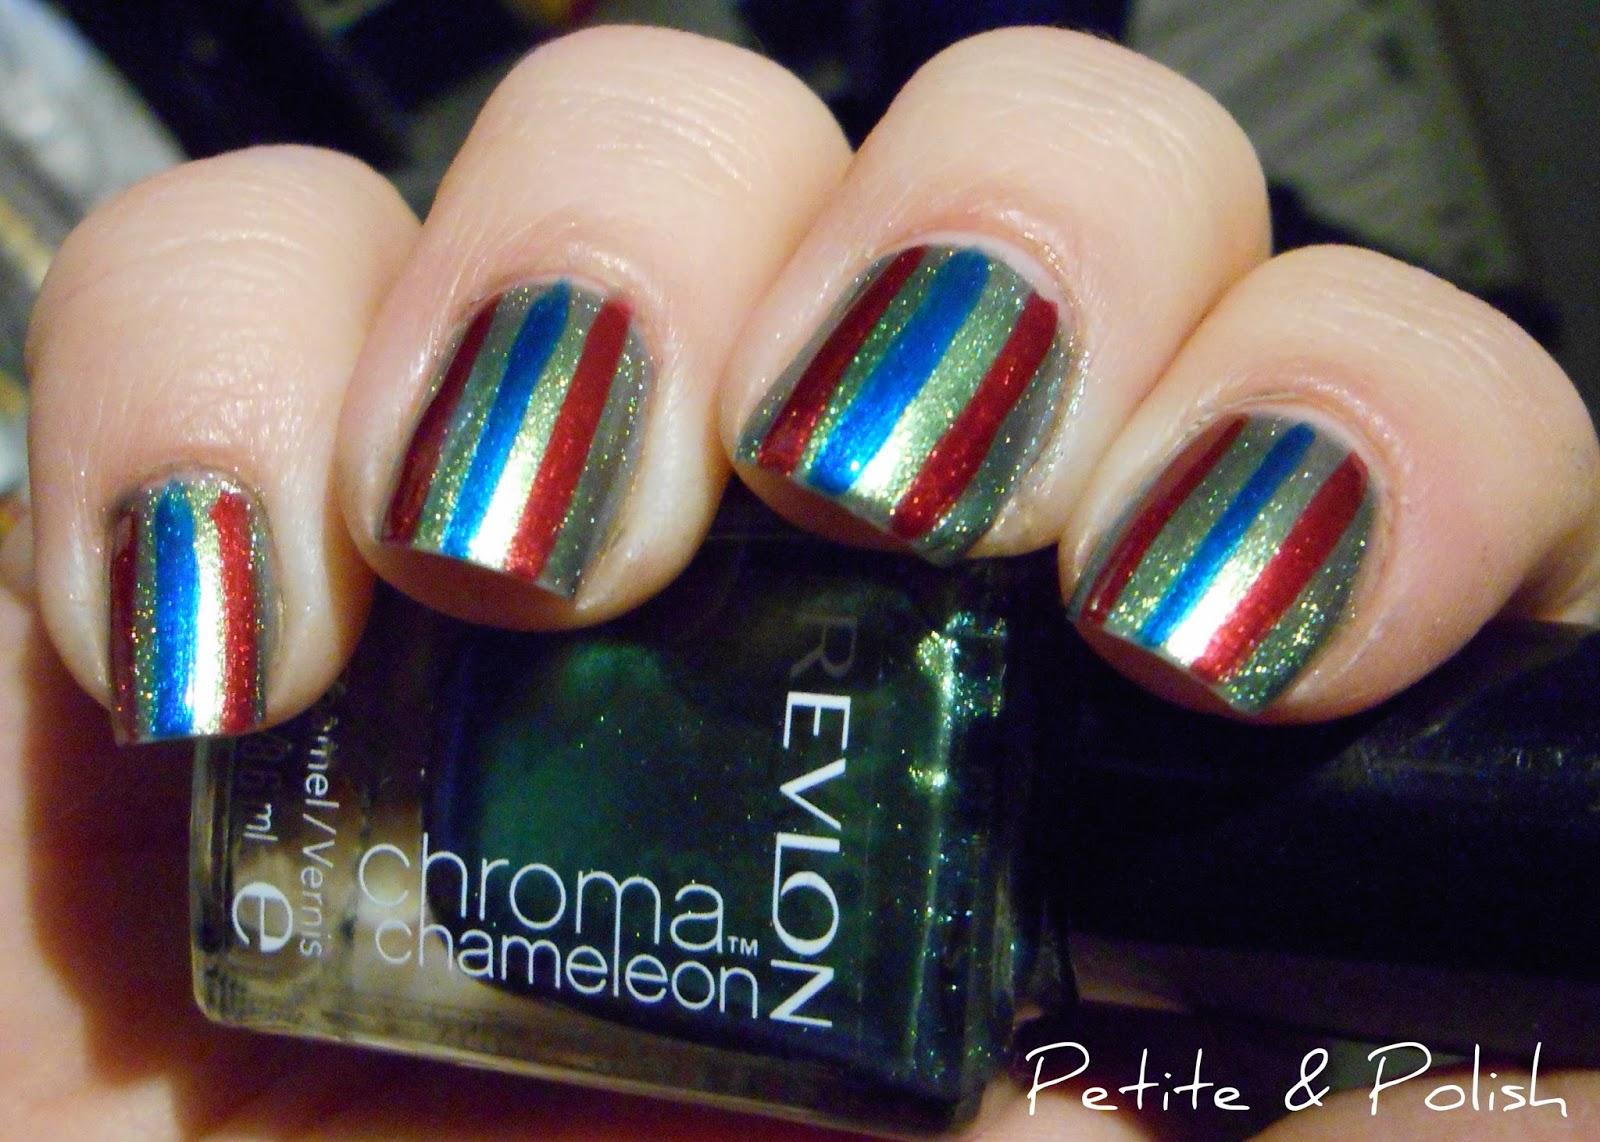 Petite & Polish: Nail Art A-Go-Go, Day 2: Jewel Tones